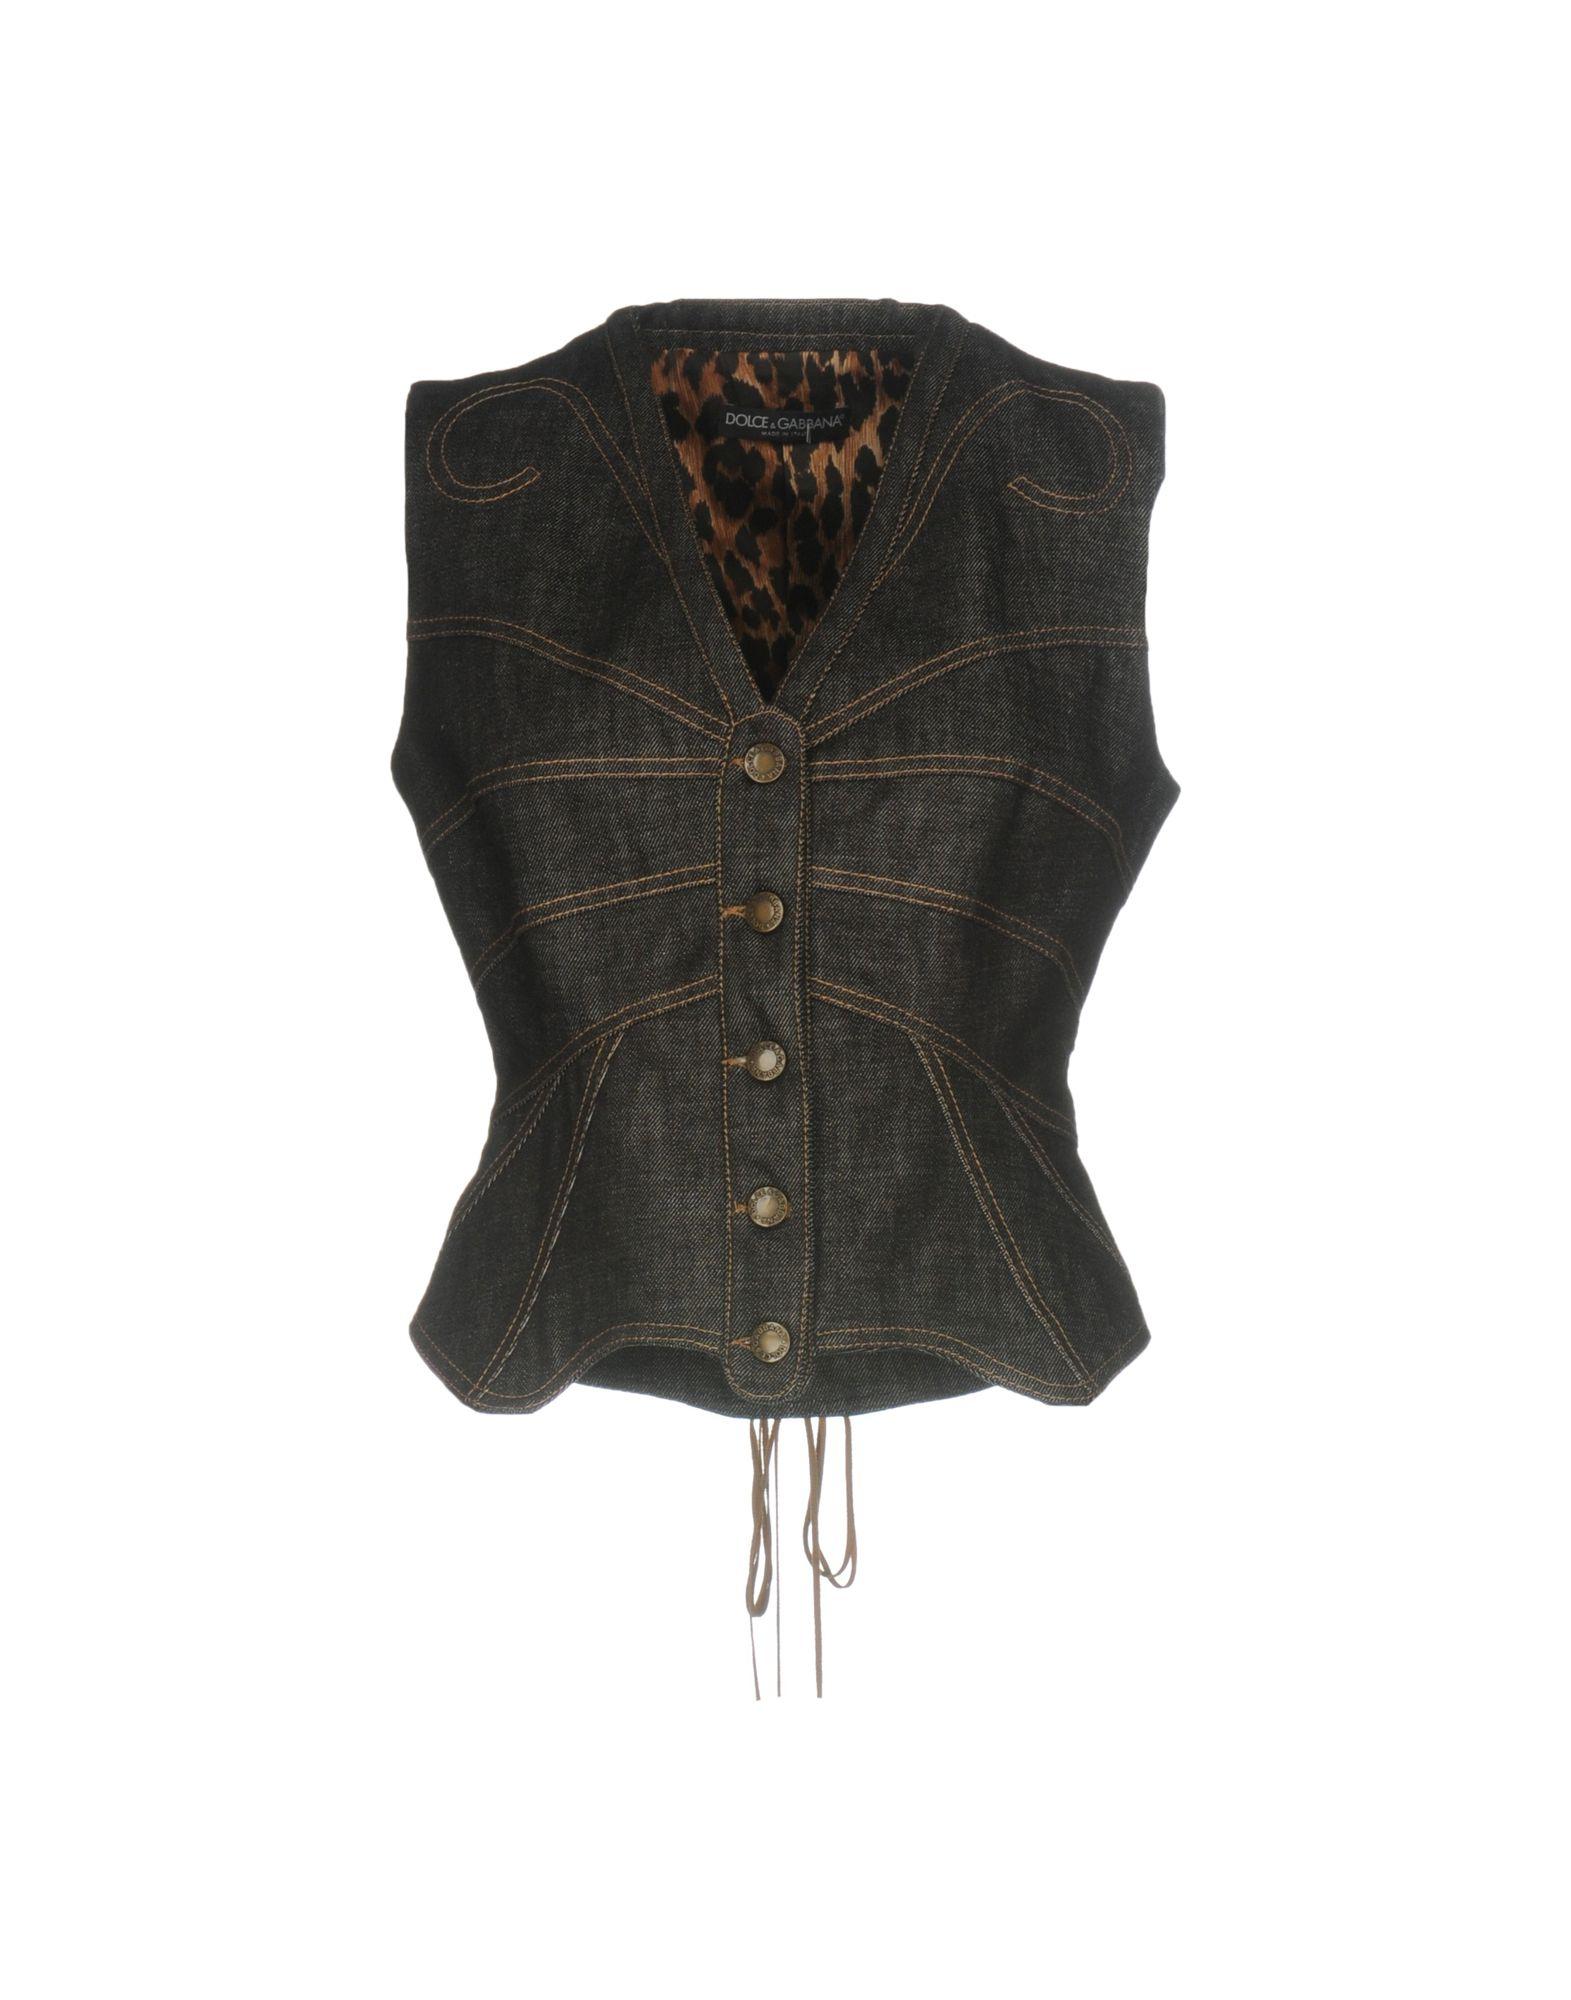 DOLCE & GABBANA Damen Jeansjacke/-mantel Farbe Schwarz Größe 4